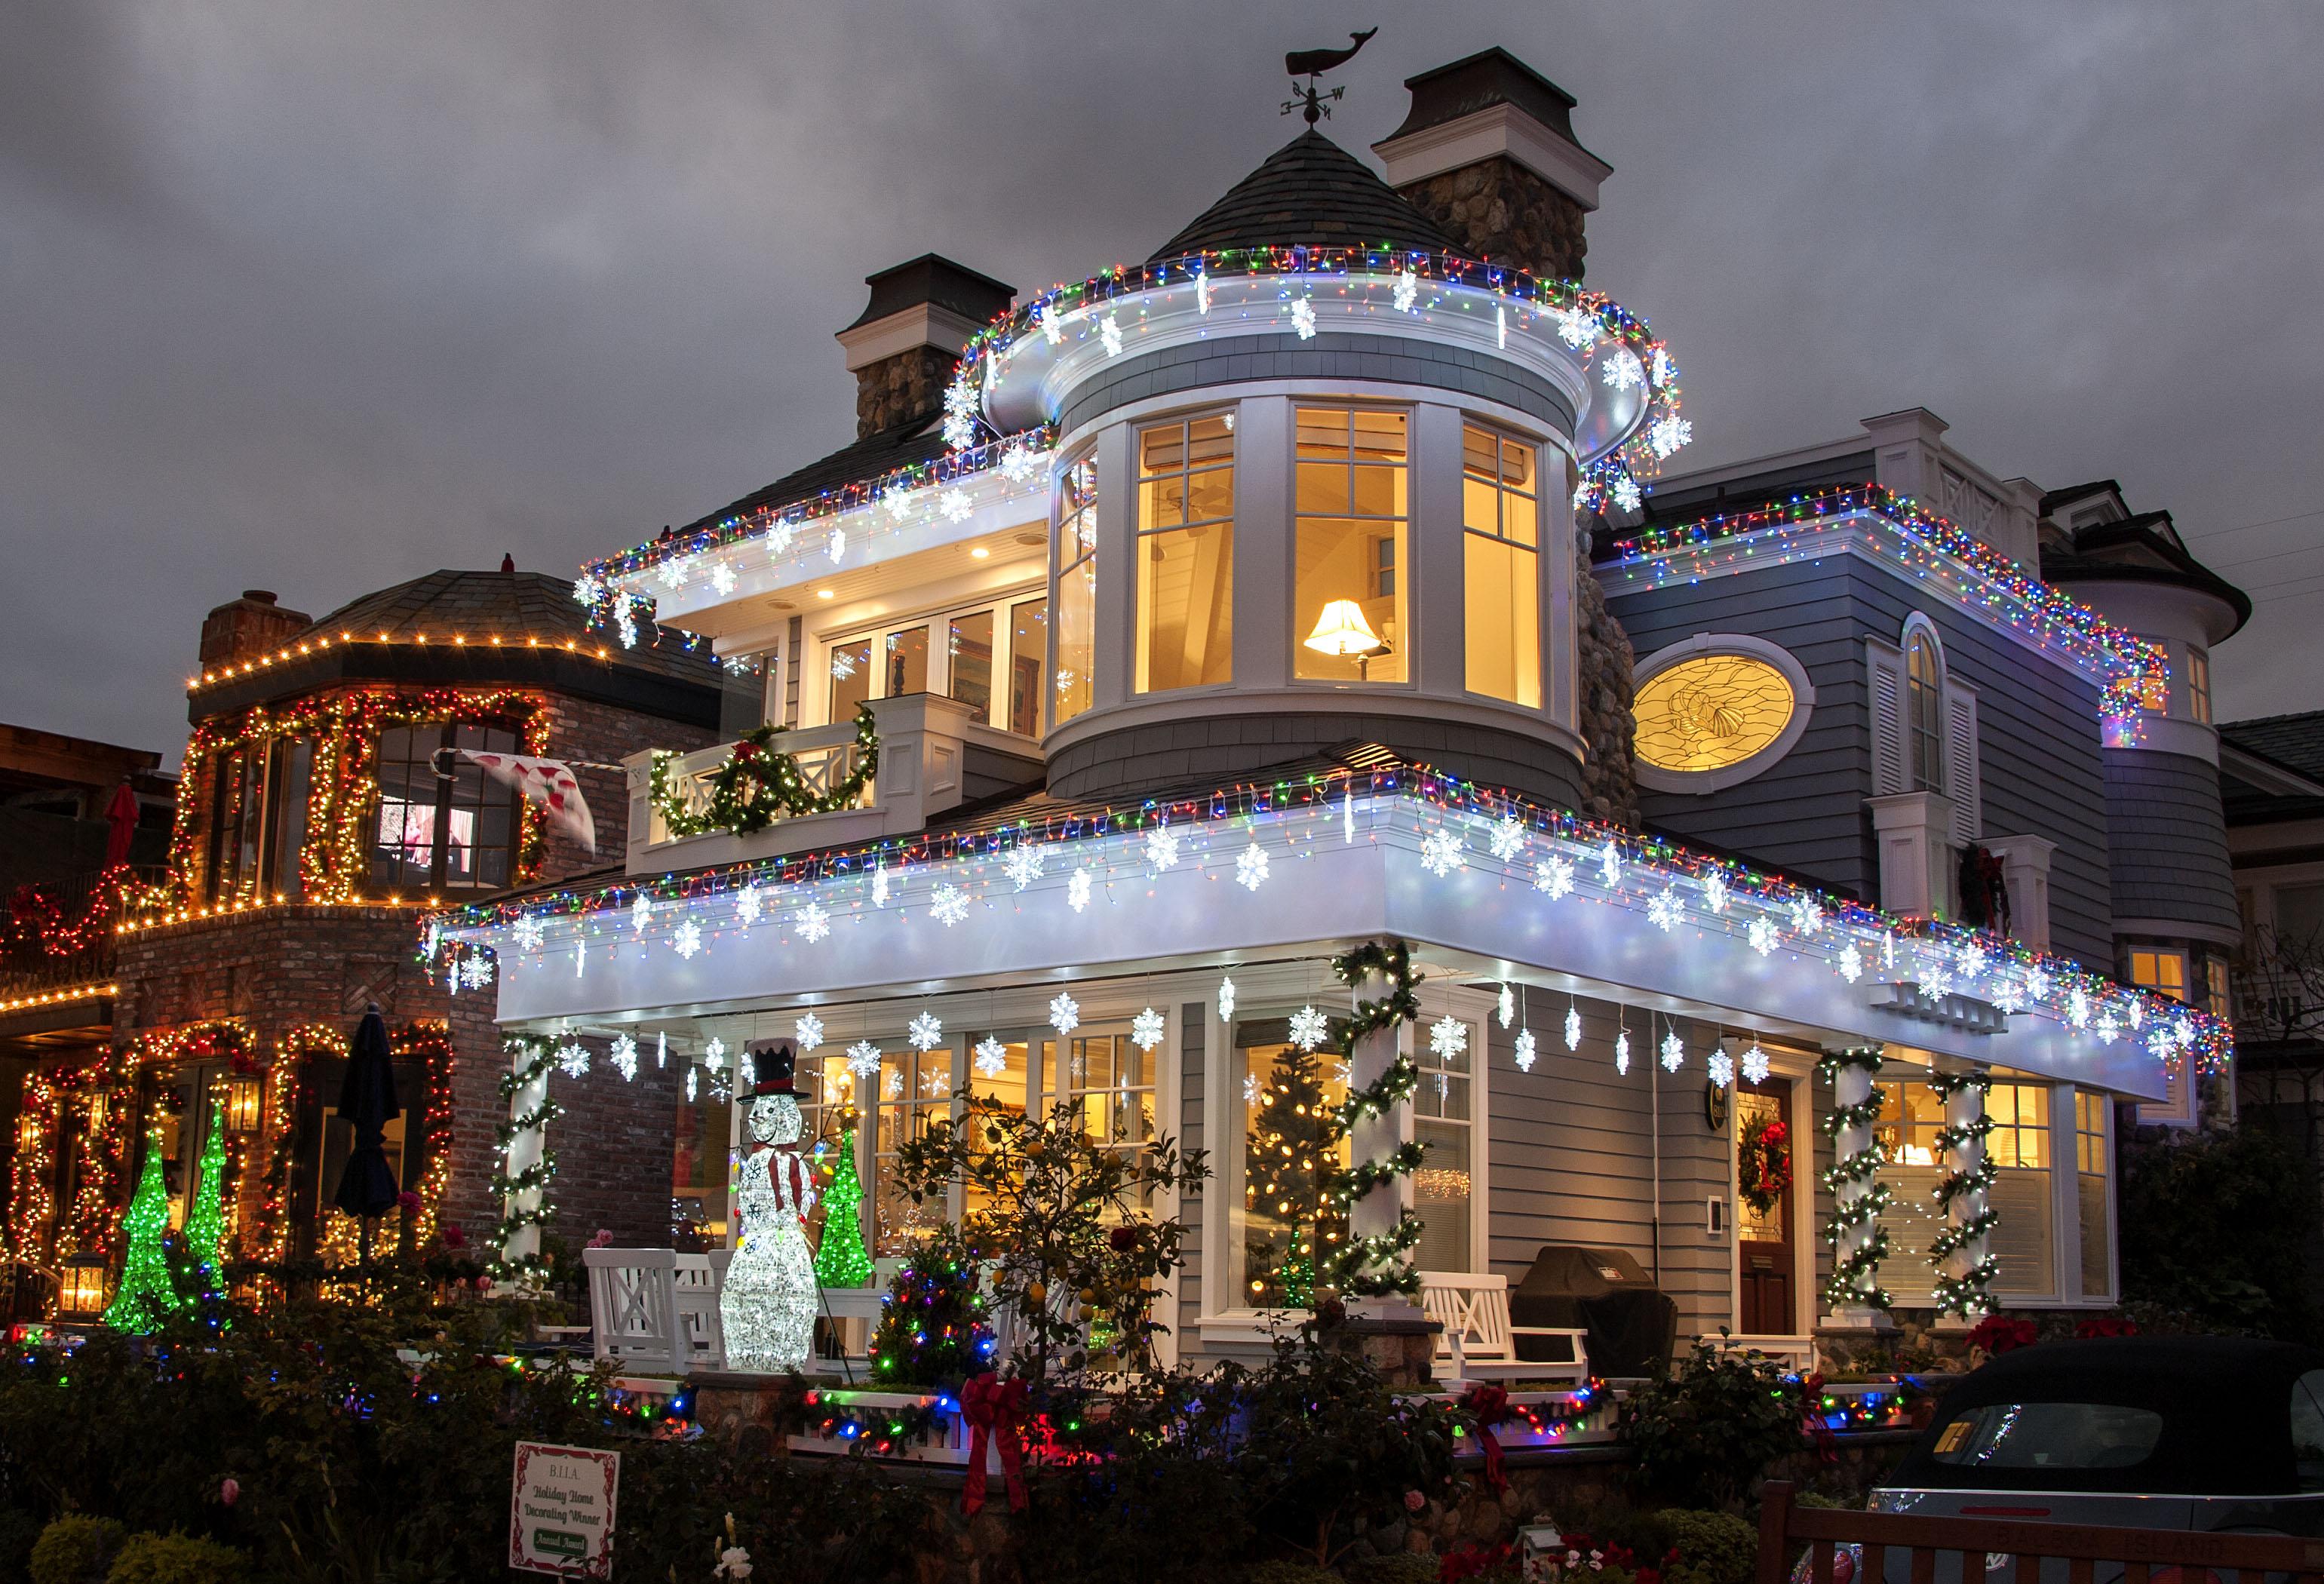 Balboa Newport Beach Christmas Lights